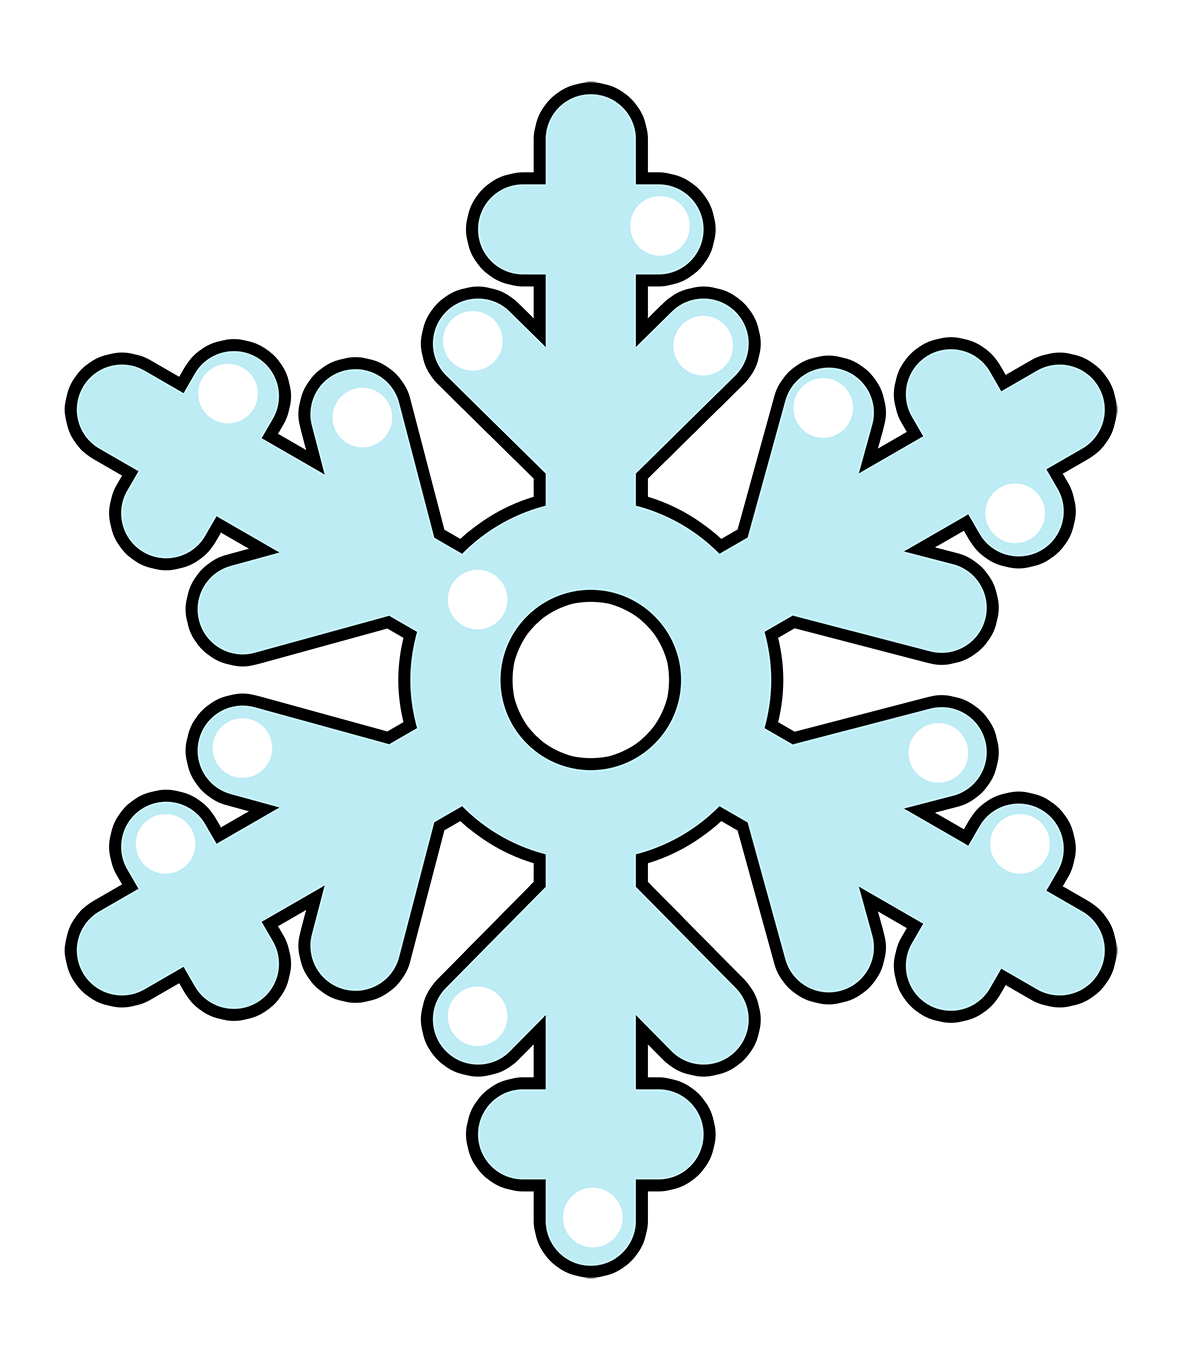 Free Cartoon Snowflake Clip Art U0026mid-Free Cartoon Snowflake Clip Art u0026middot; snowflake9-5